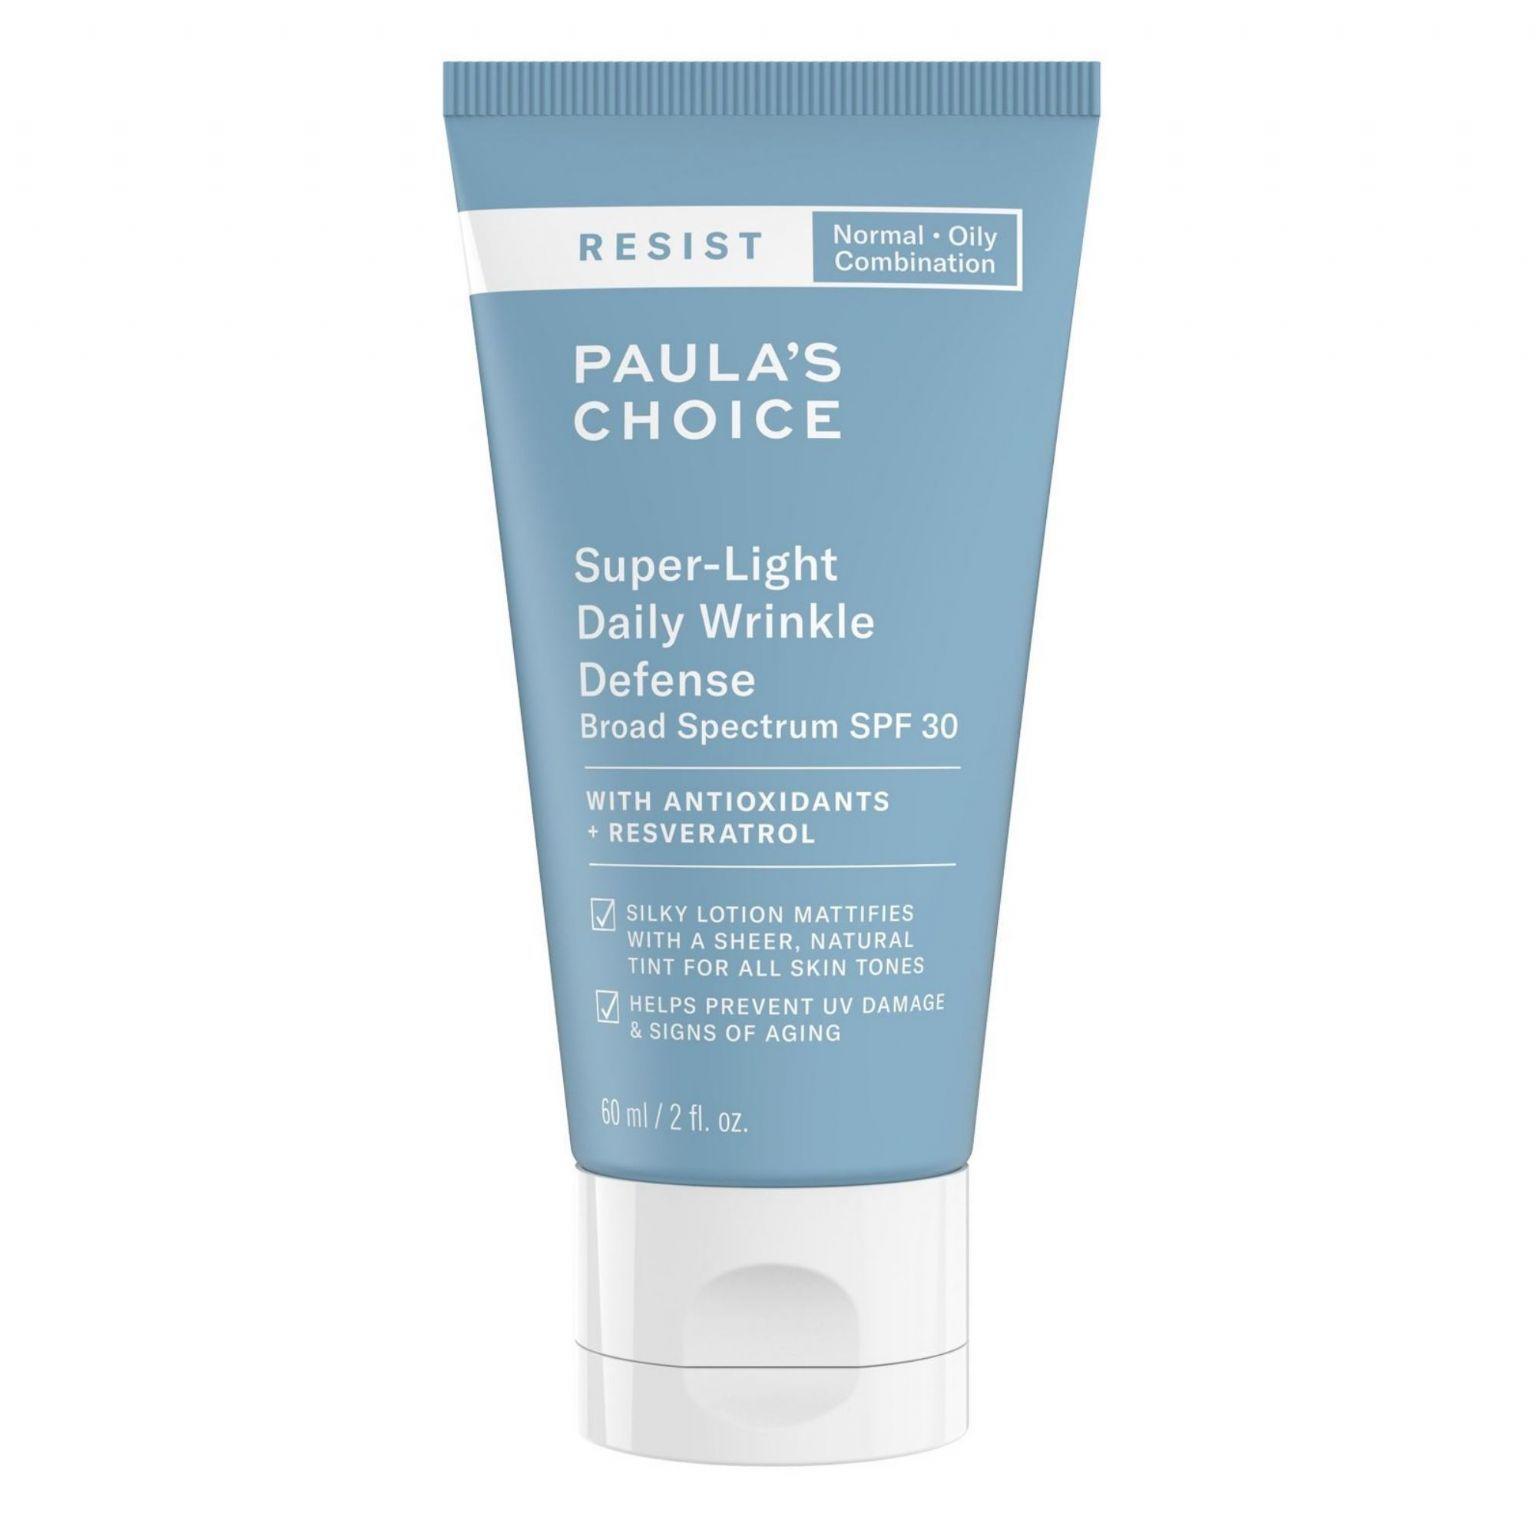 RESIST Super-Light Daily Wrinkle Defense Broad Spectrum SPF 30 - Normal/Oily/Combination Skin